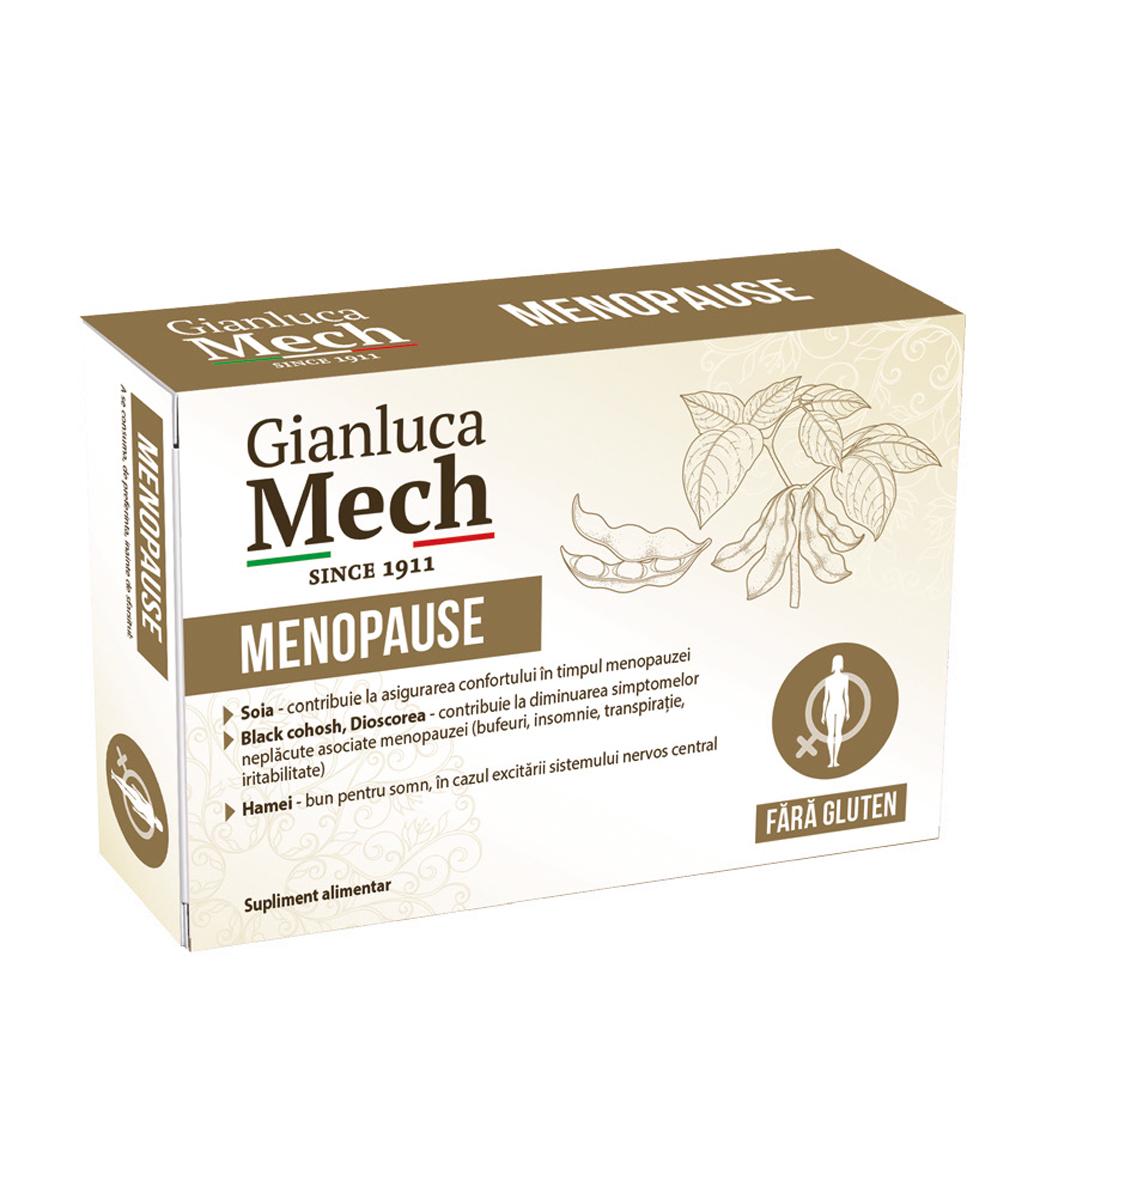 Gianluca Mech Menopause